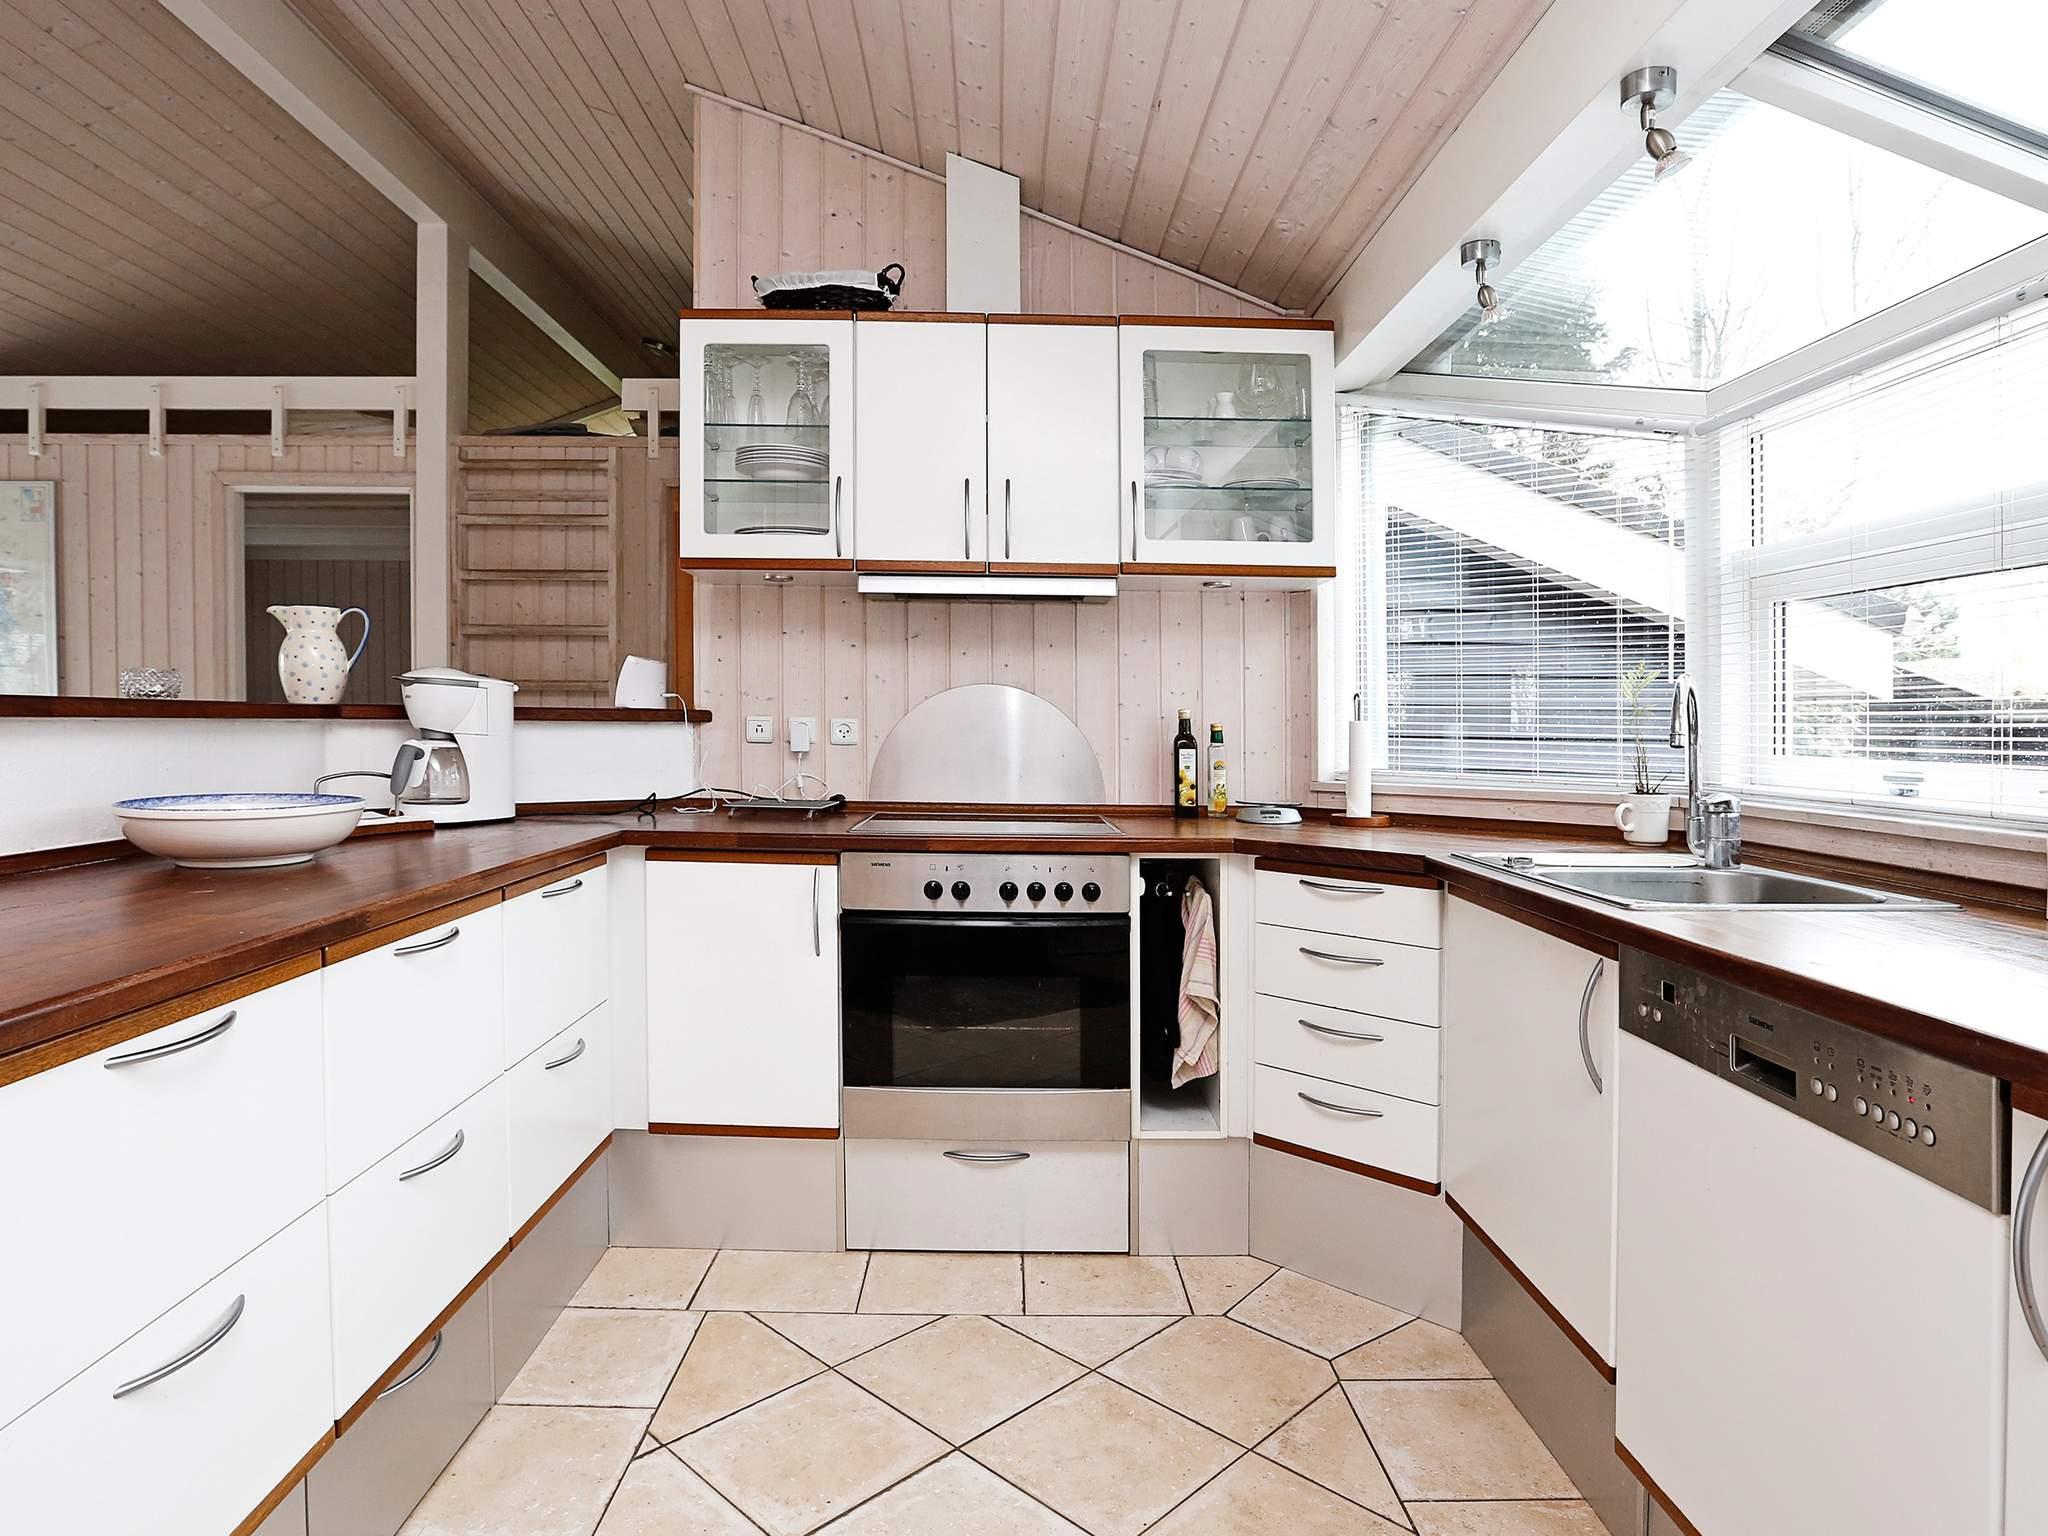 Maison de vacances Skibby (124927), Kirke Hyllinge, , Seeland Nord, Danemark, image 8